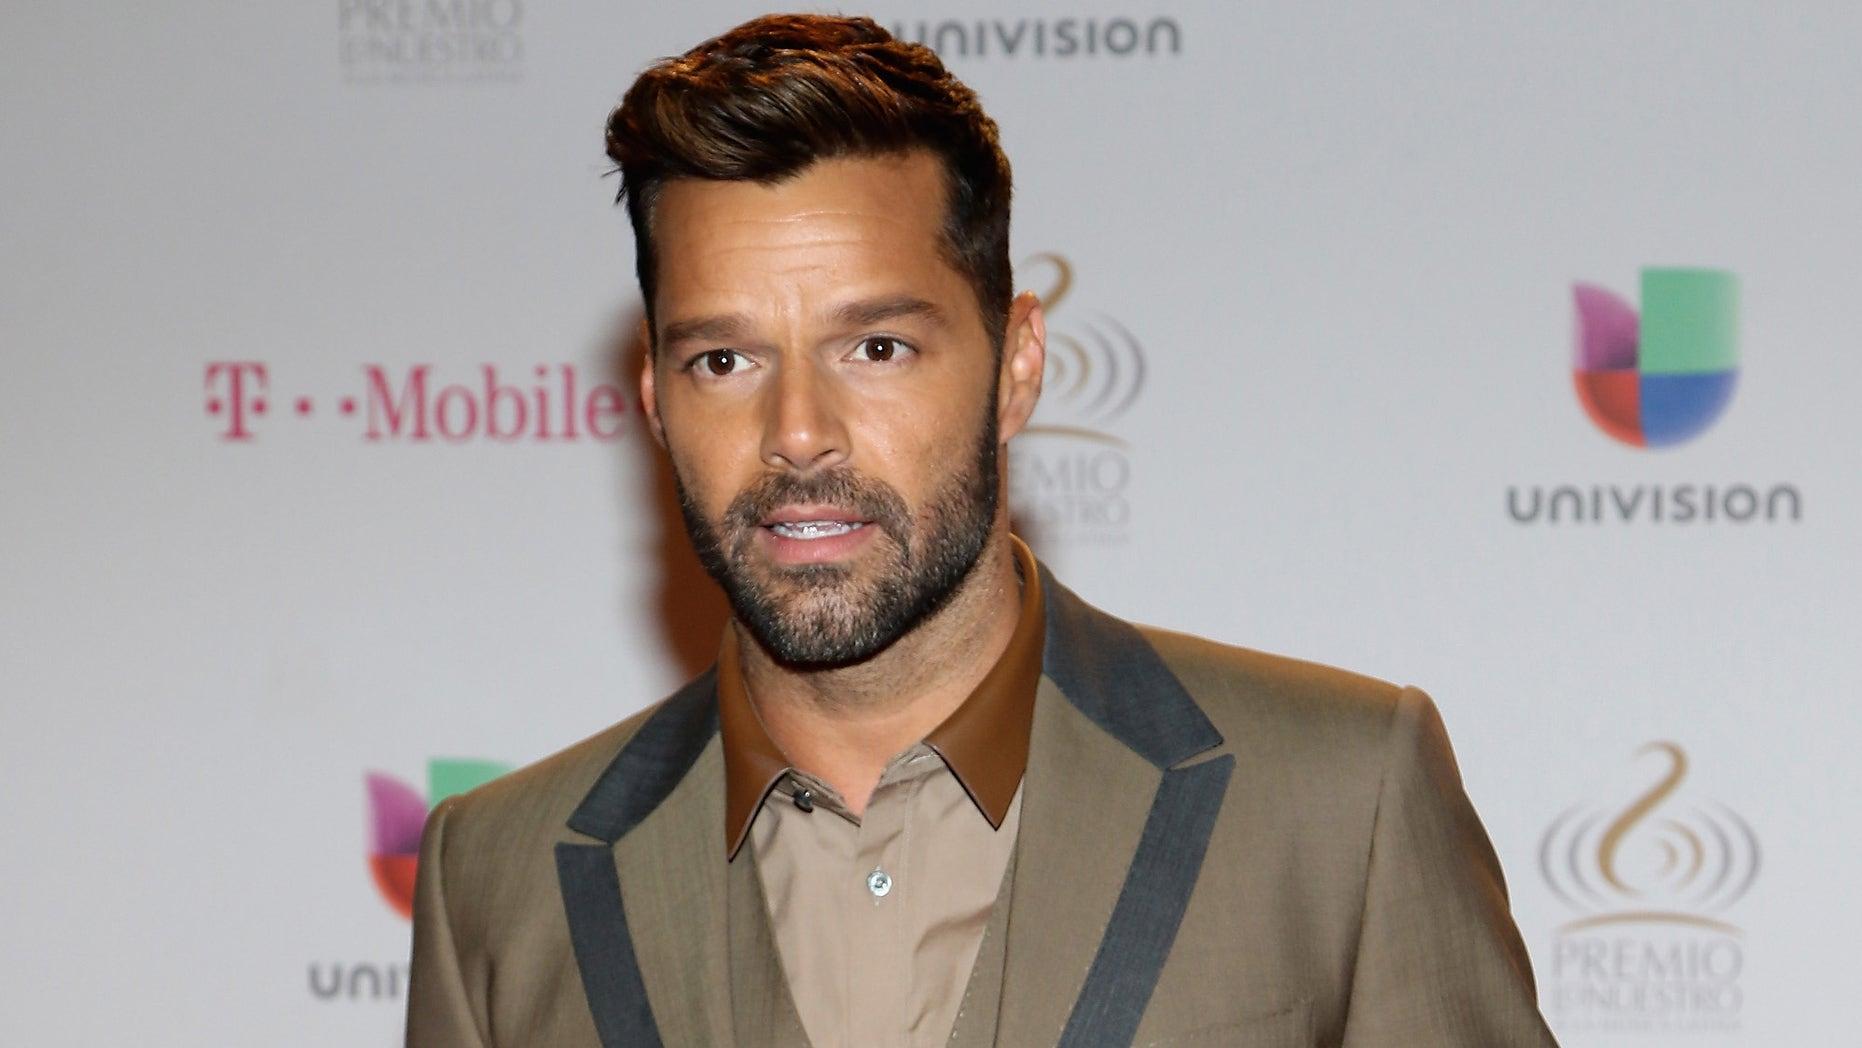 Ricky Martin attends the 2015 Premios Lo Nuestro Awards on February 19, 2015 in Miami, Florida.